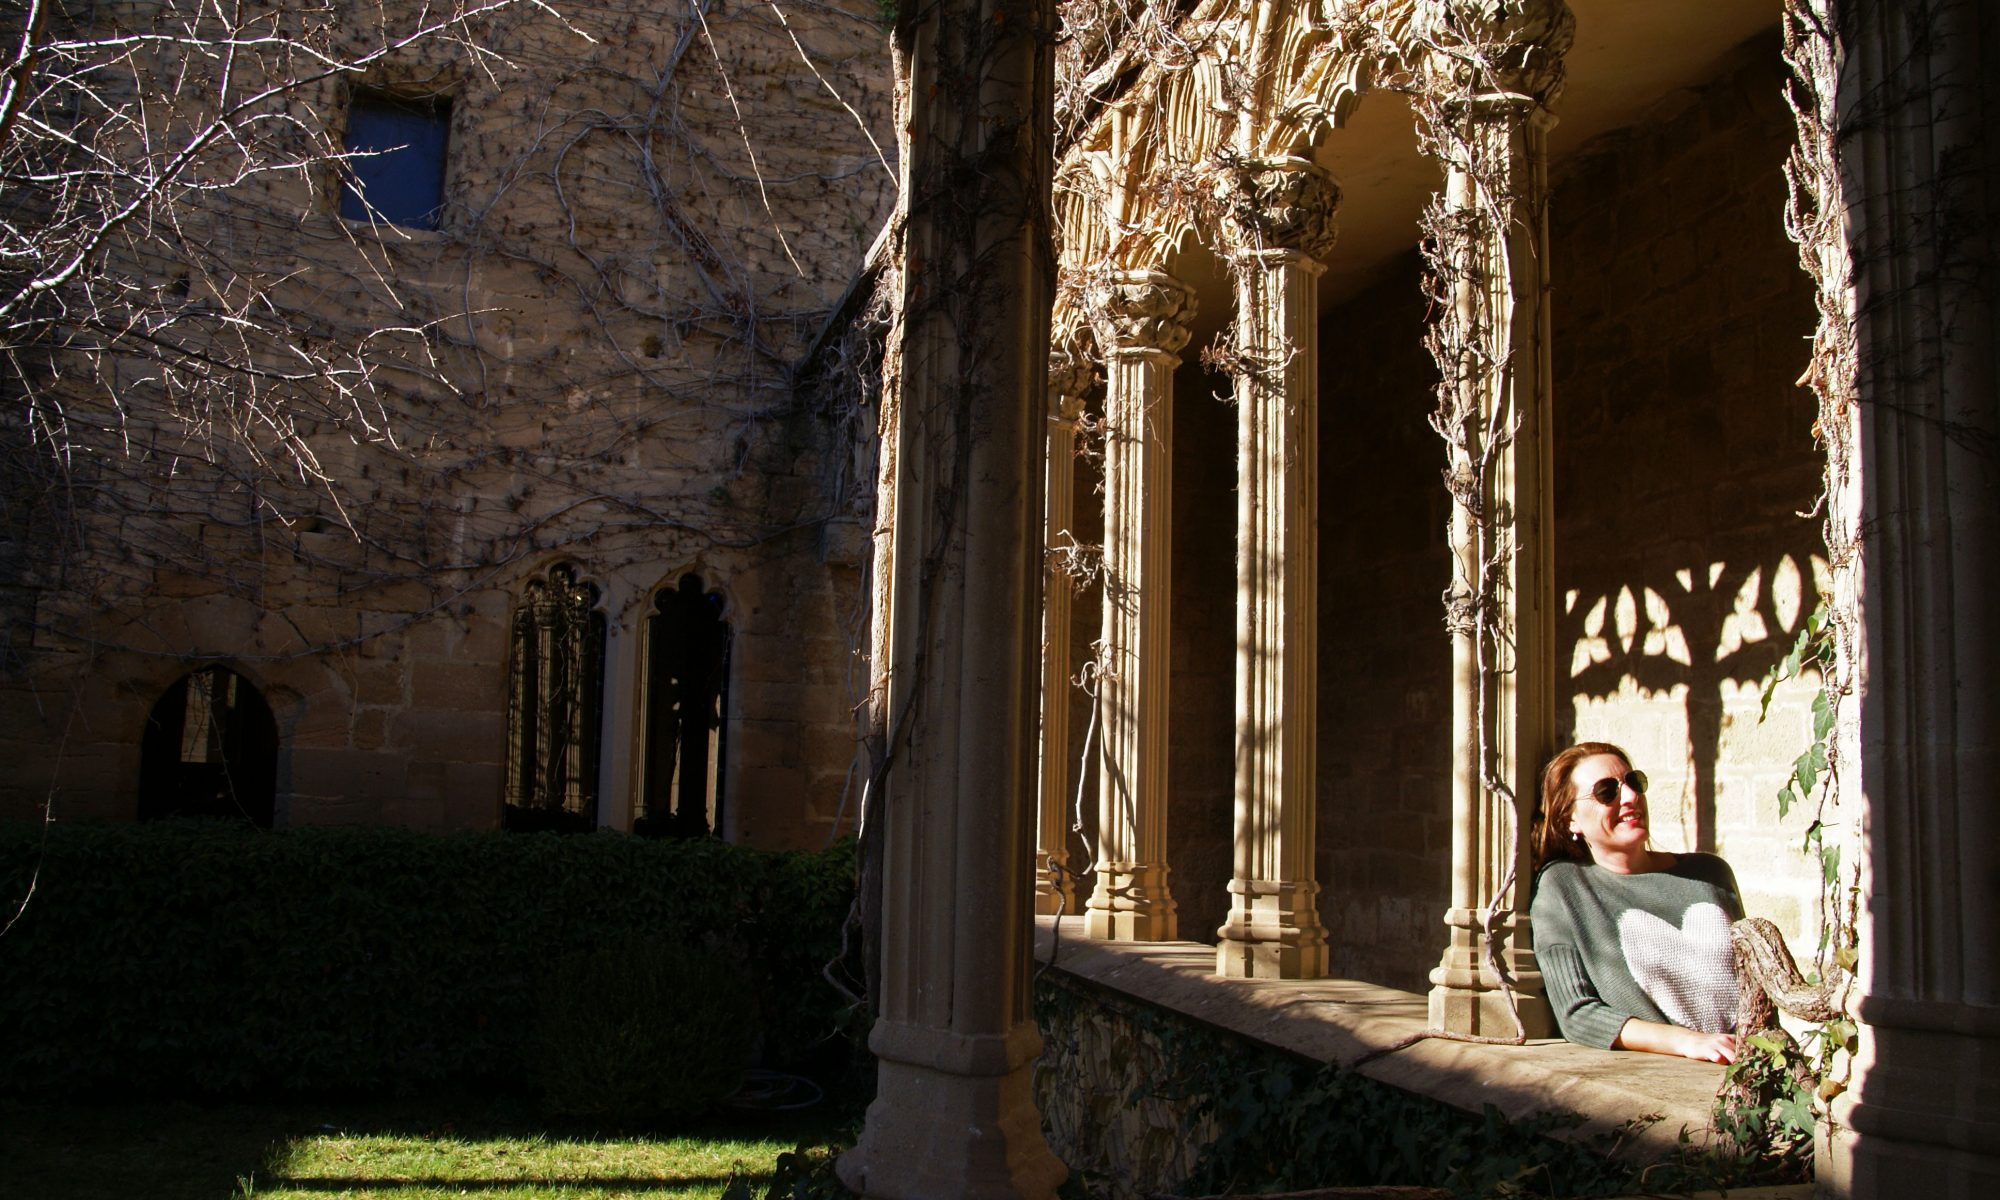 Galeria de la reina, Palacio Real de Olite